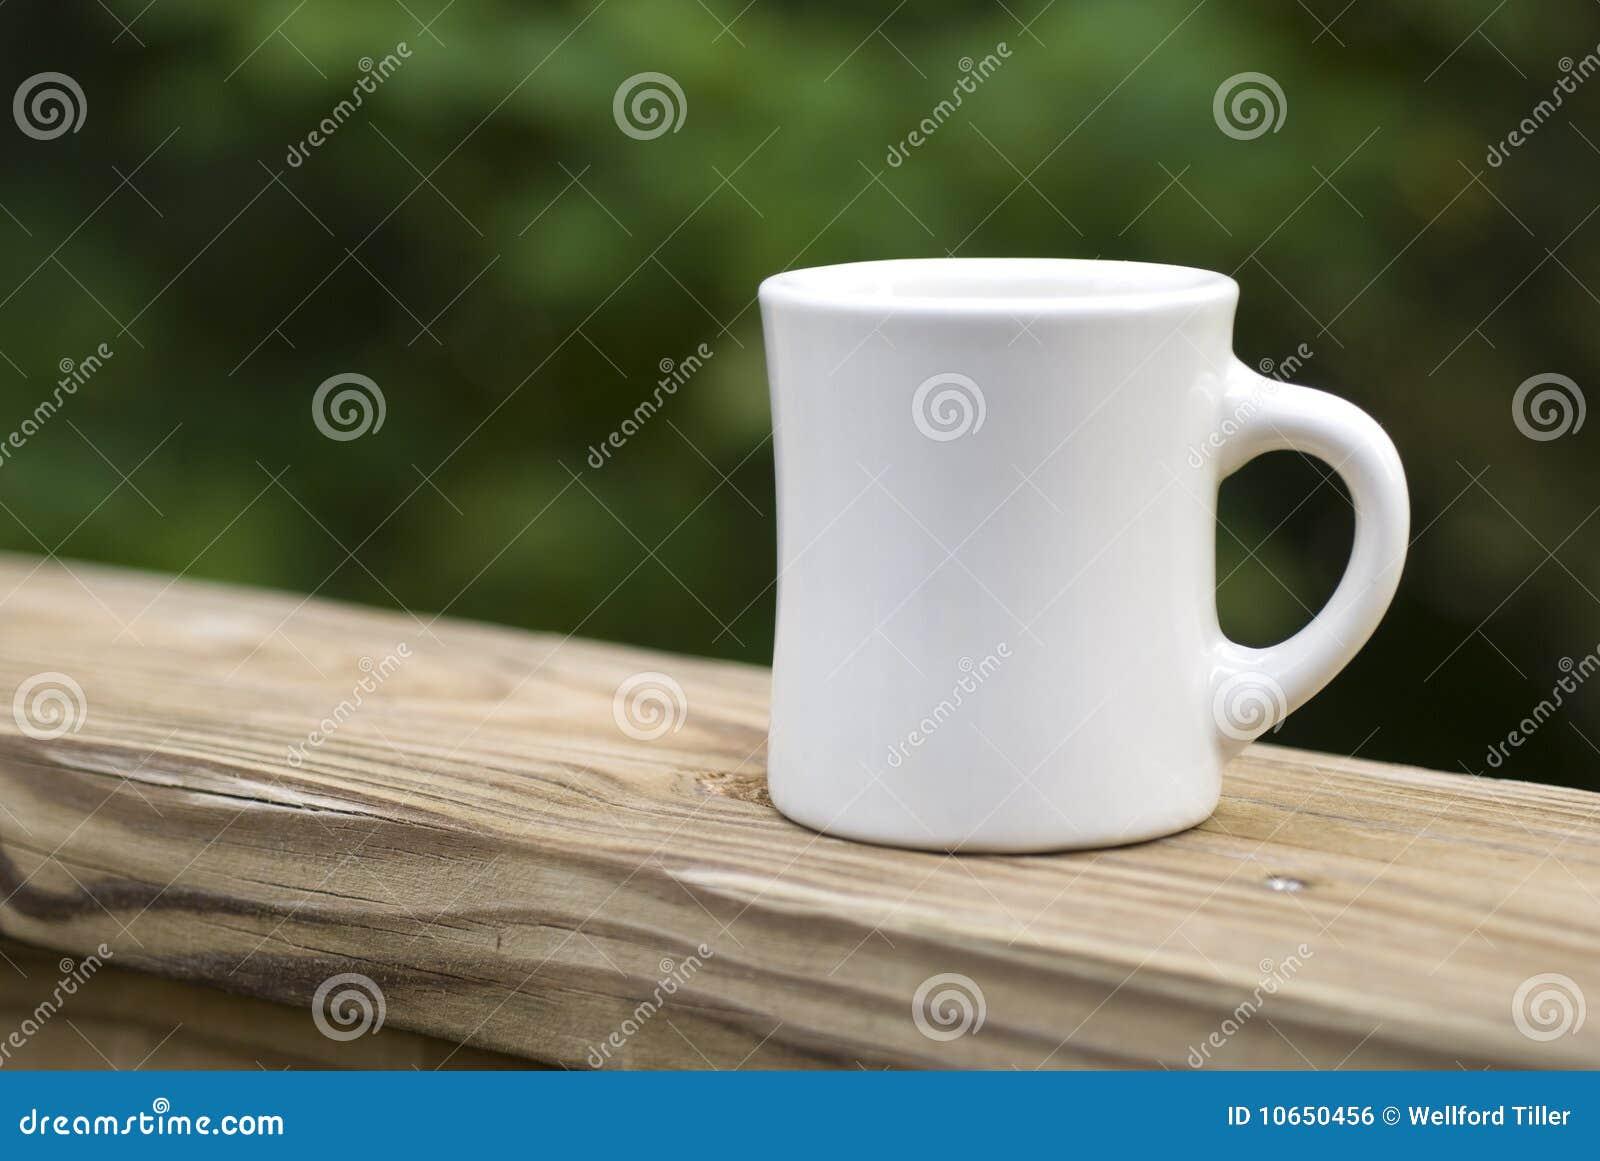 021ad4cf7c6 Coffee Mug on Railing stock photo. Image of wood, ceramic - 10650456